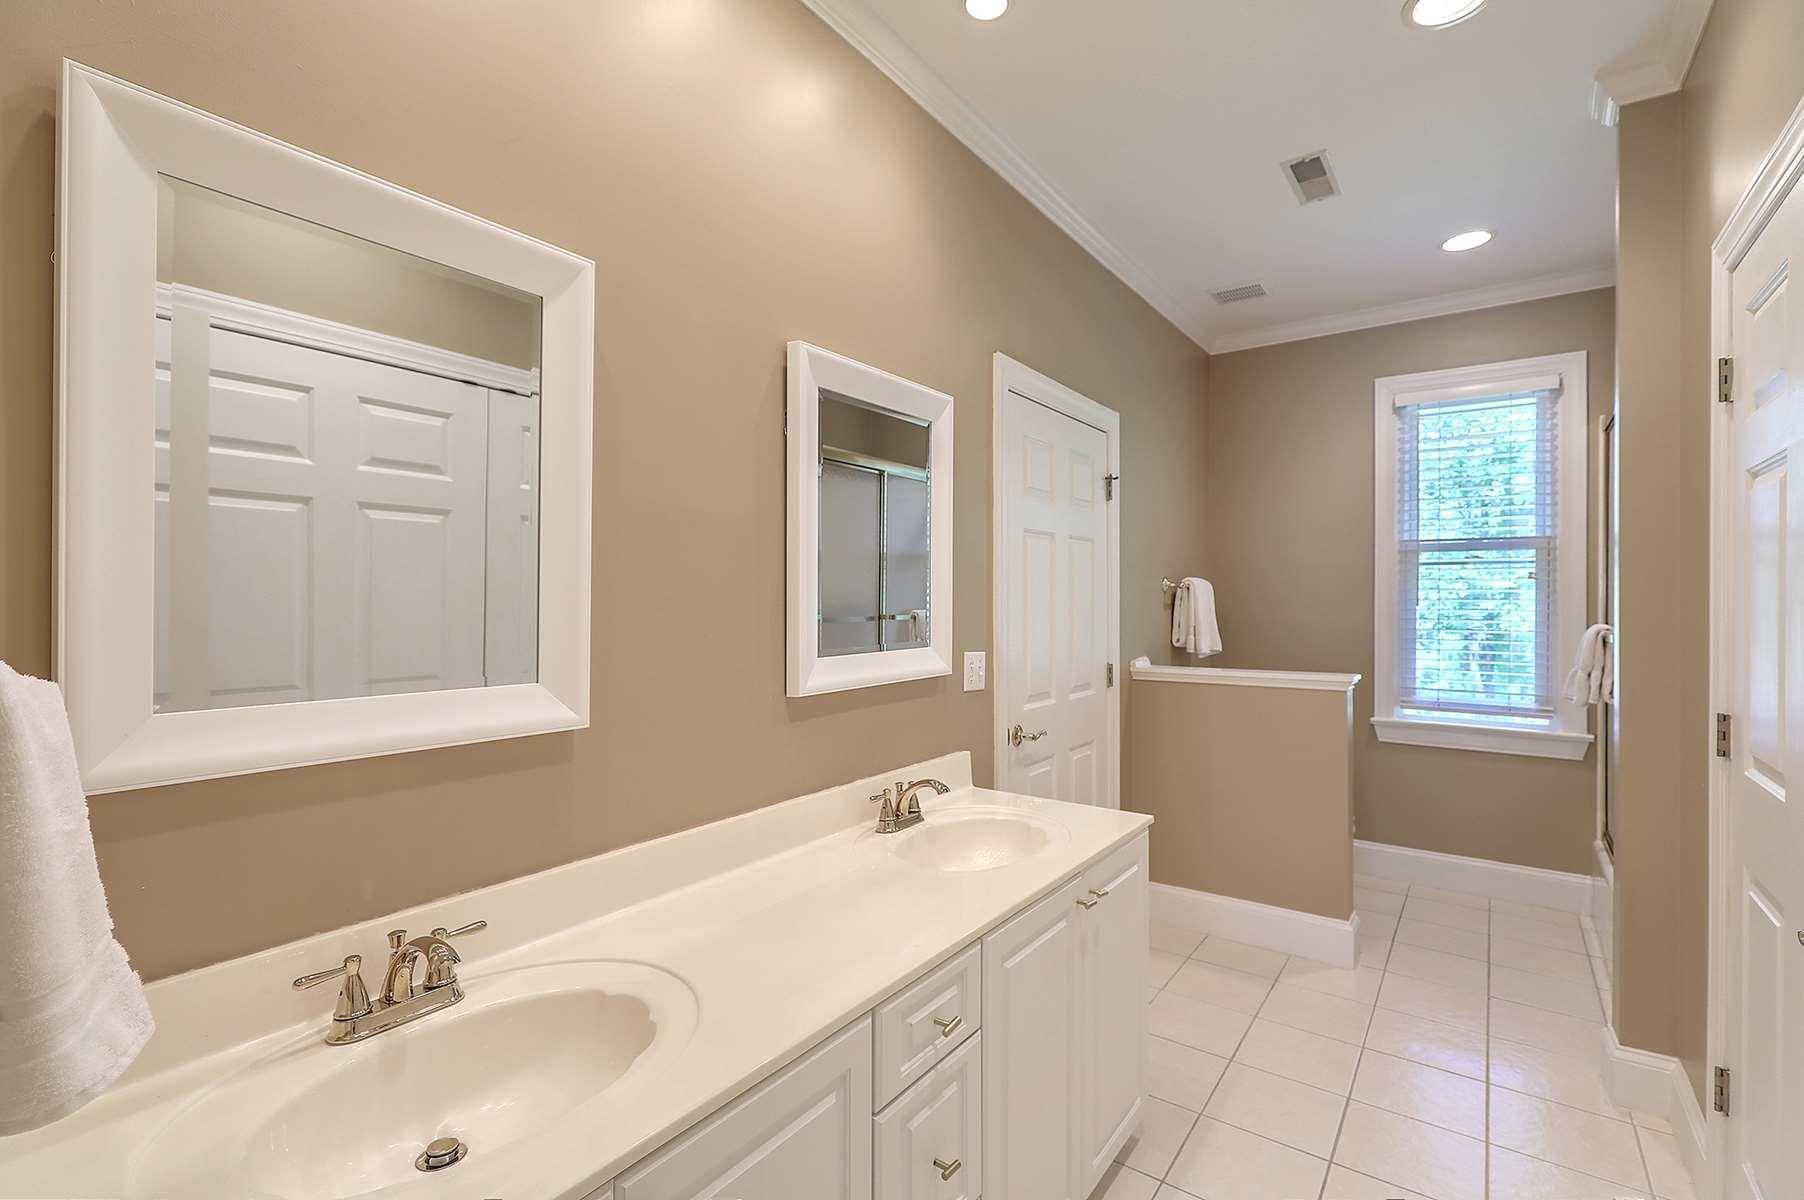 Dunes West Homes For Sale - 2961 Pignatelli, Mount Pleasant, SC - 50